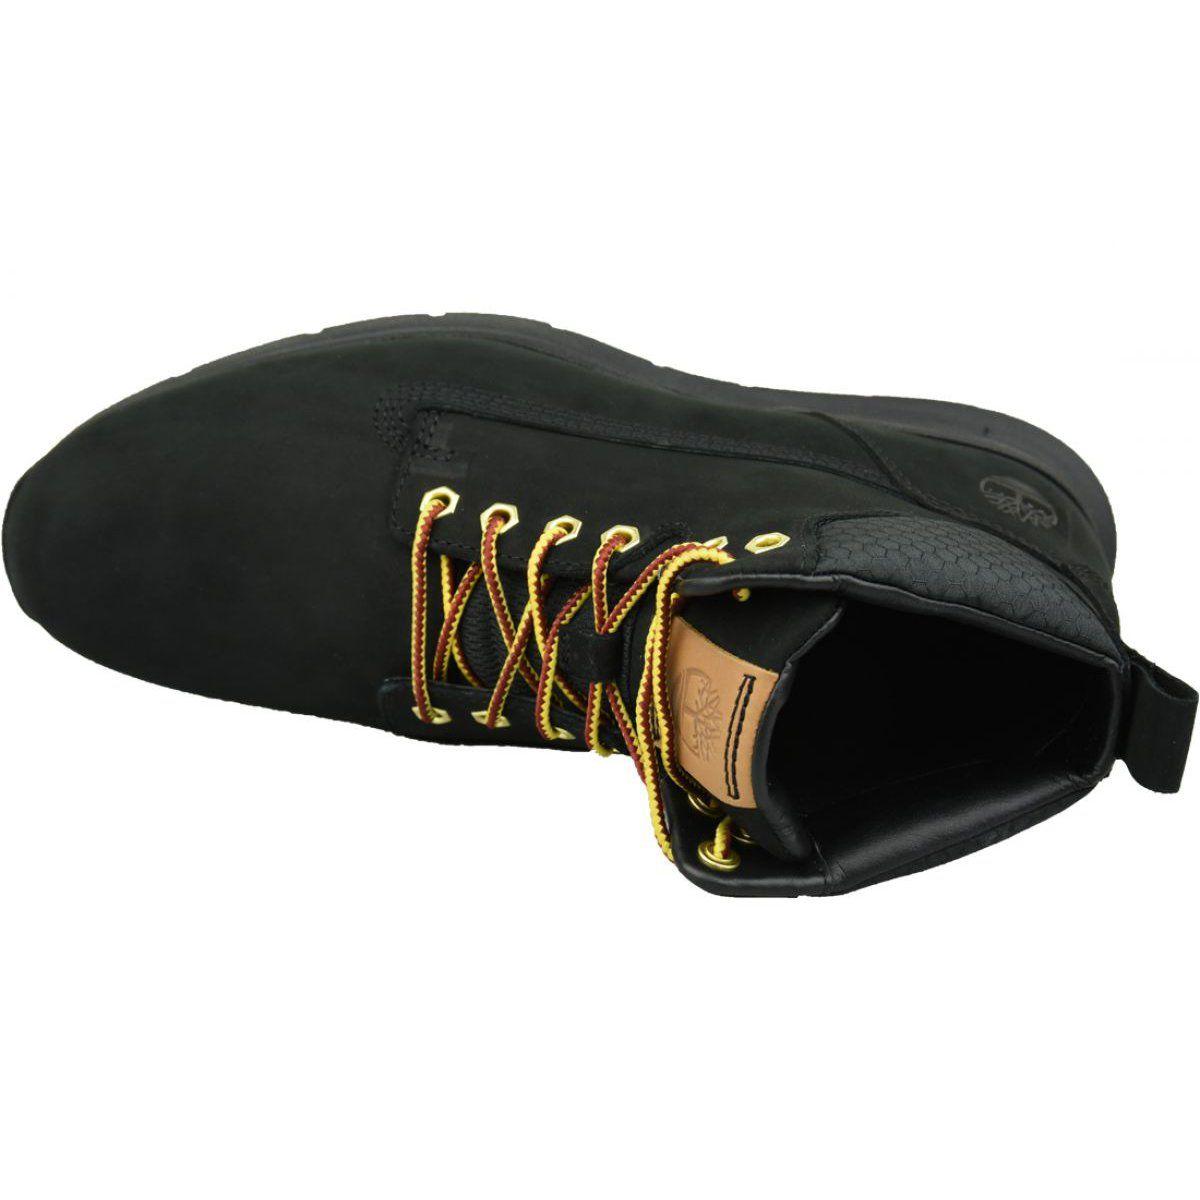 Buty Timberland Killington Chukka M A19uk Czarne Szare Killington Chukka Sport Shoes Men Black Shoes